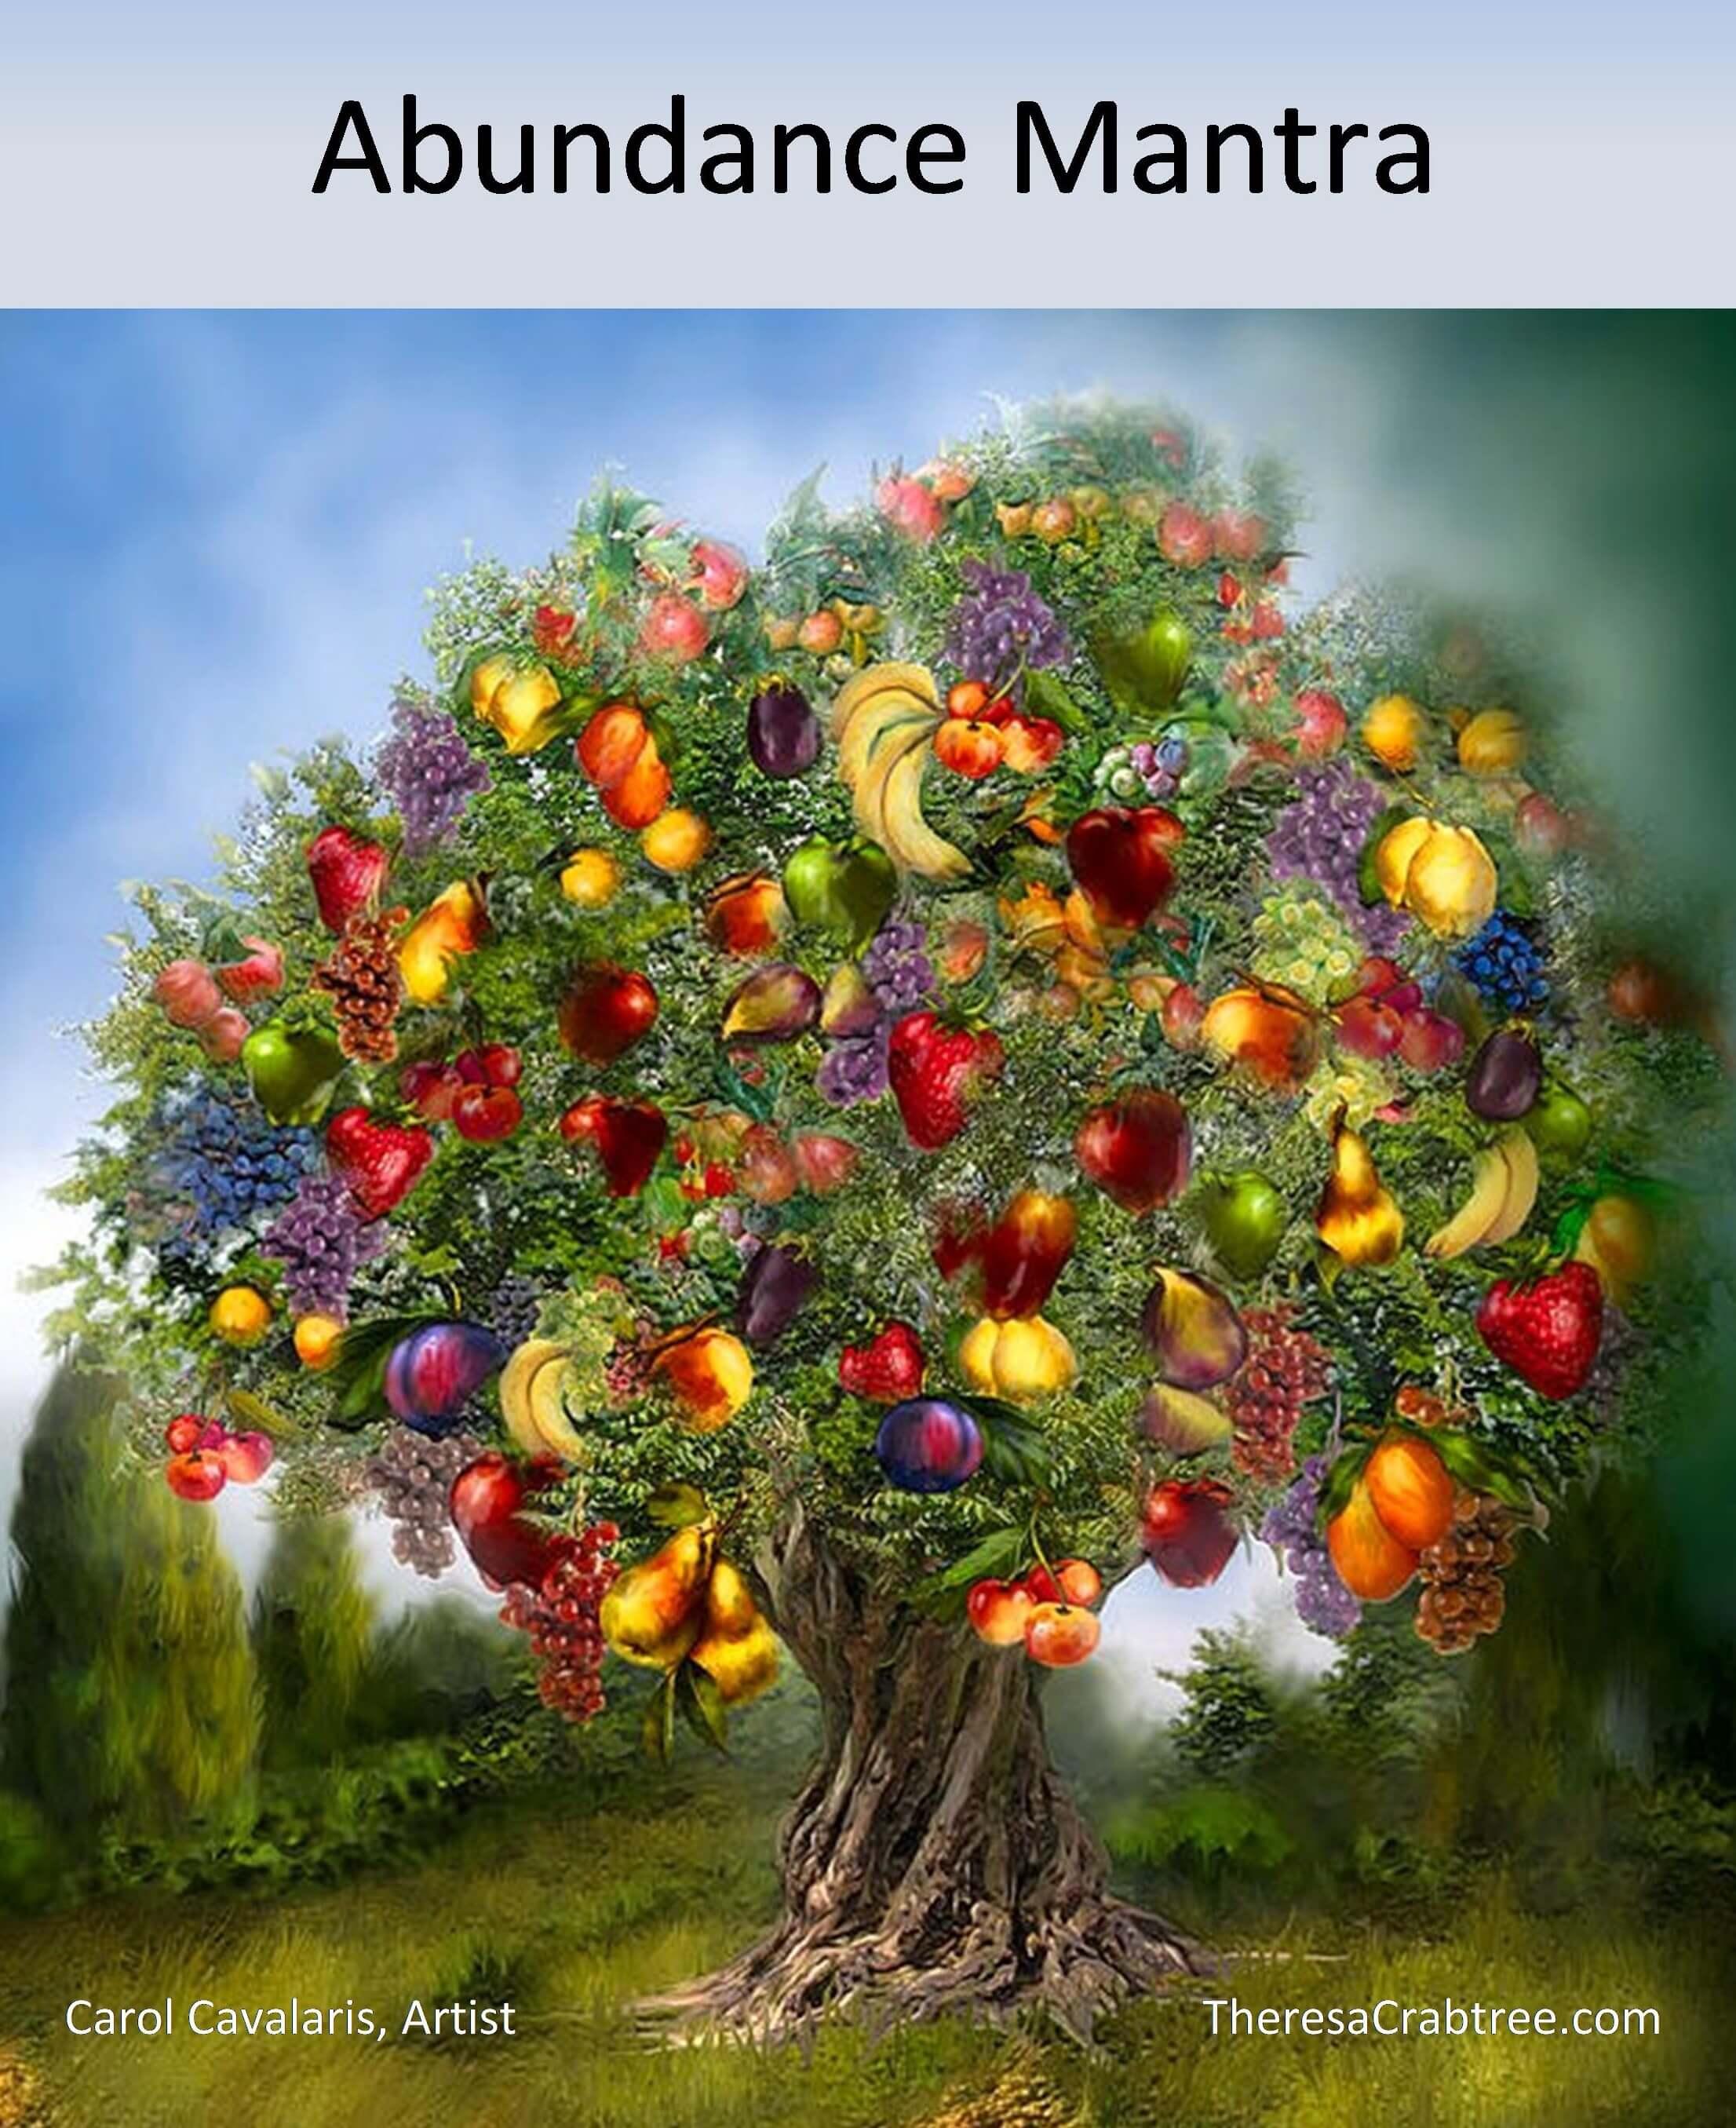 Abundance Mantra